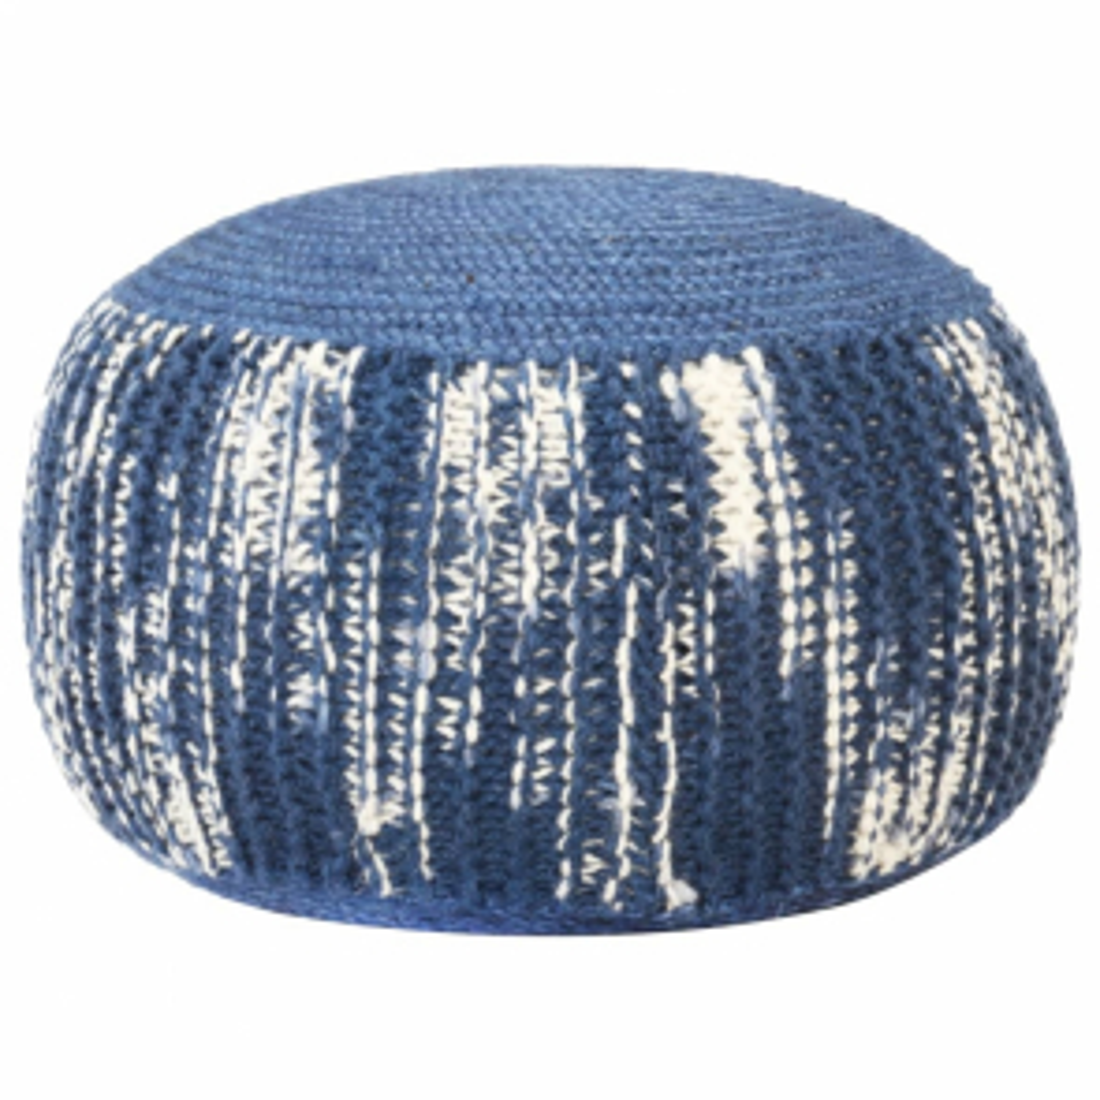 vidaXL Ručně pletený sedací puf modro-bílý 50 x 35 cm vlna [287606]